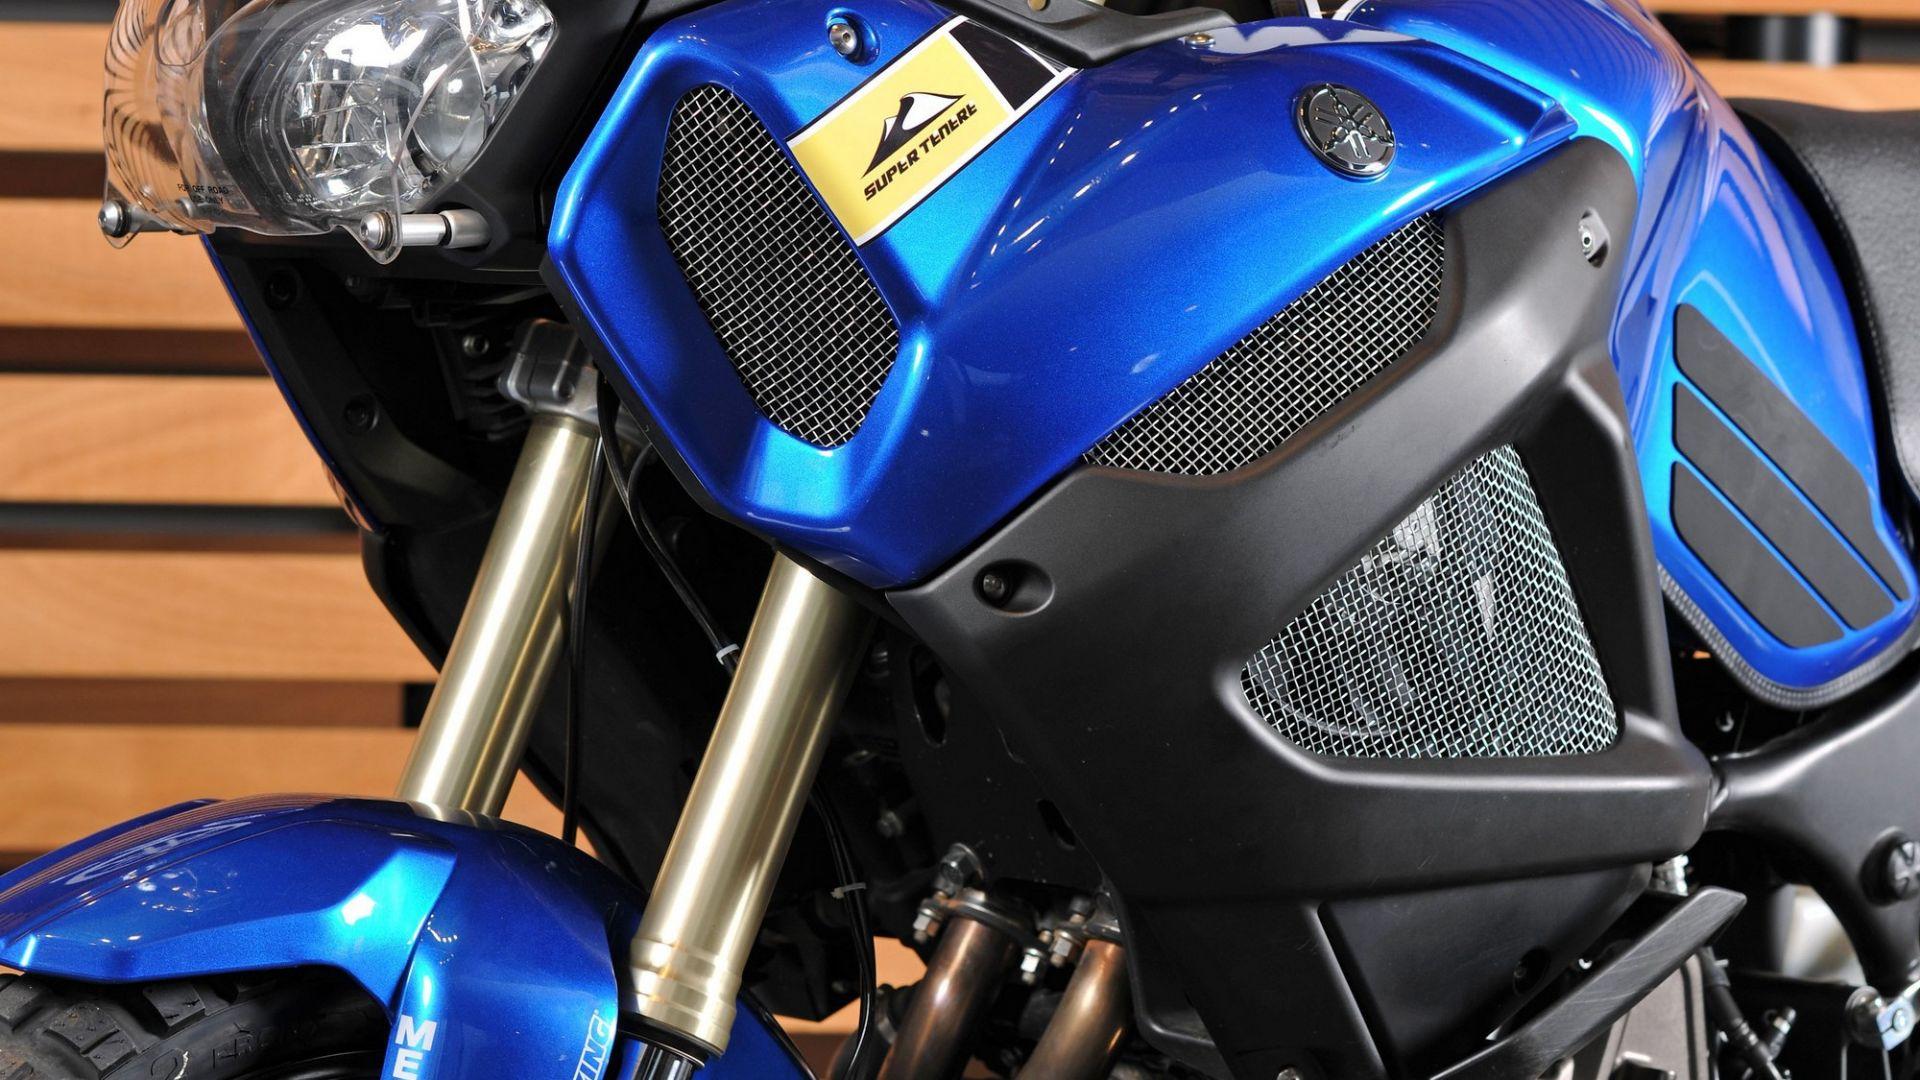 Immagine 1: Yamaha Super Ténéré XTZ1200 R